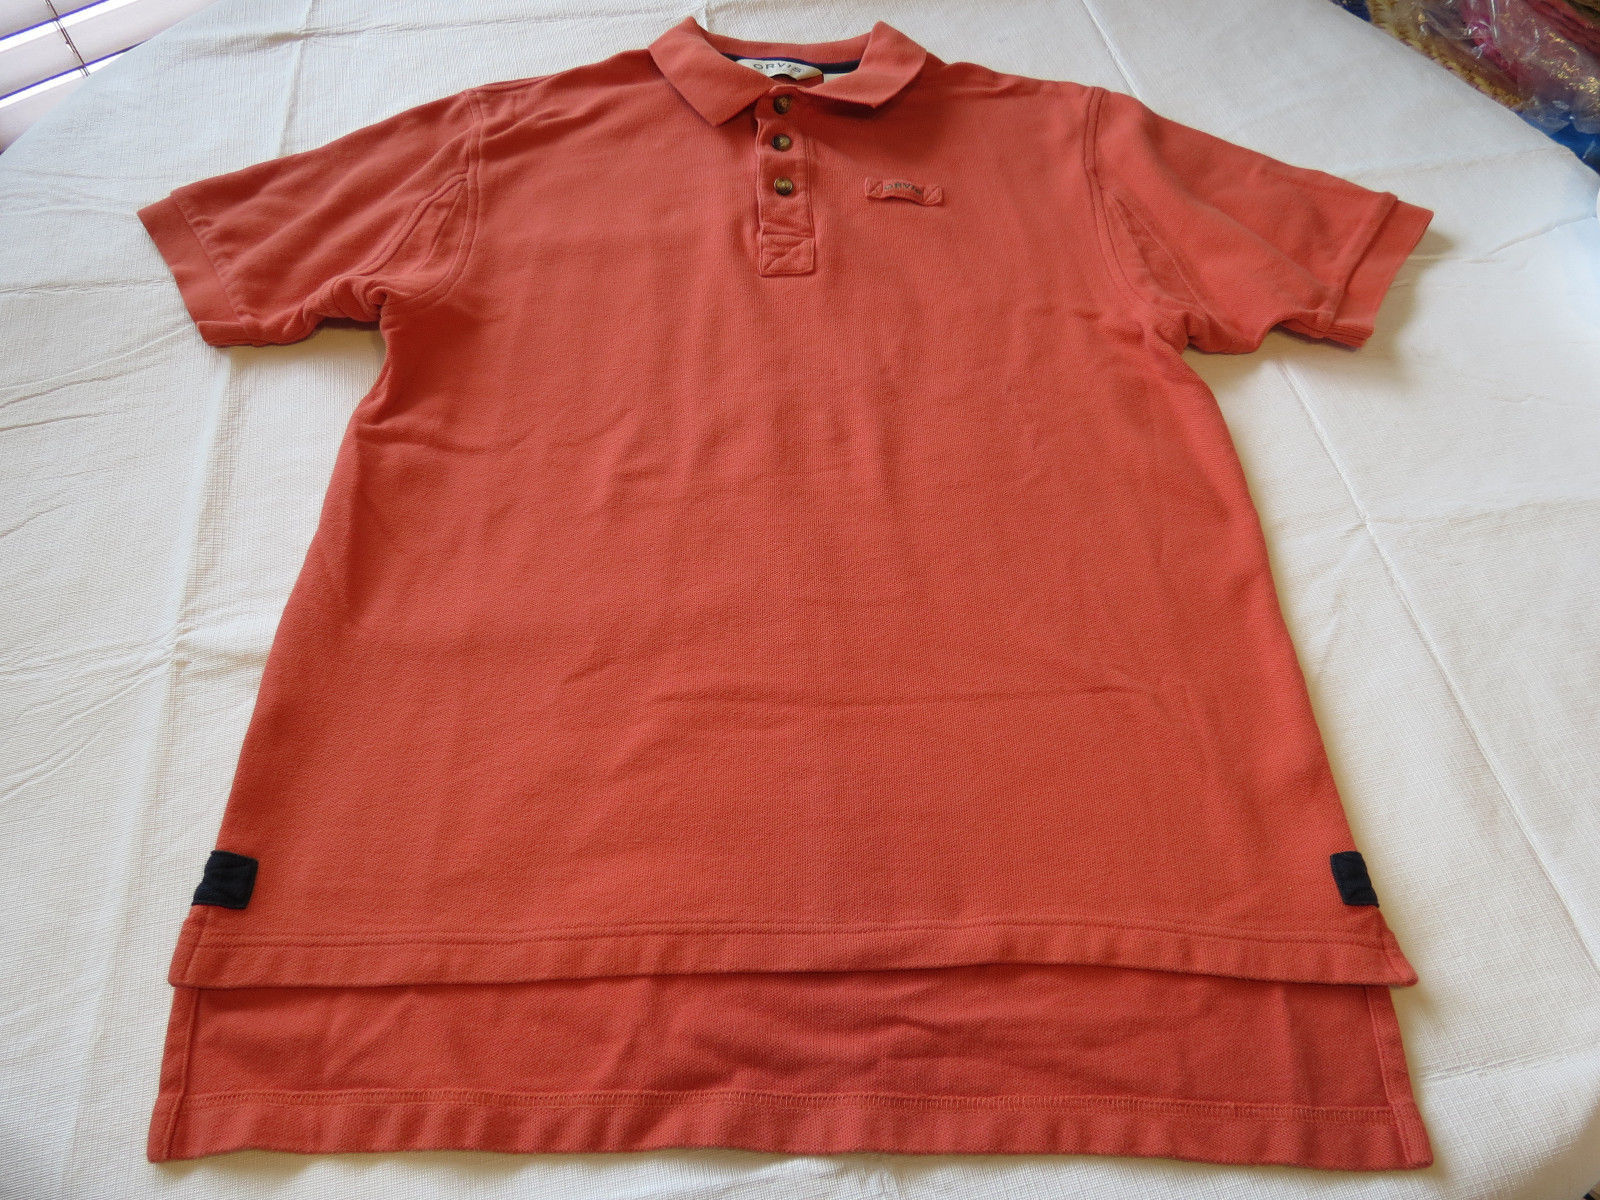 265b26772d3 Mens Orvis orange polo shirt cotton M short and 11 similar items. 57